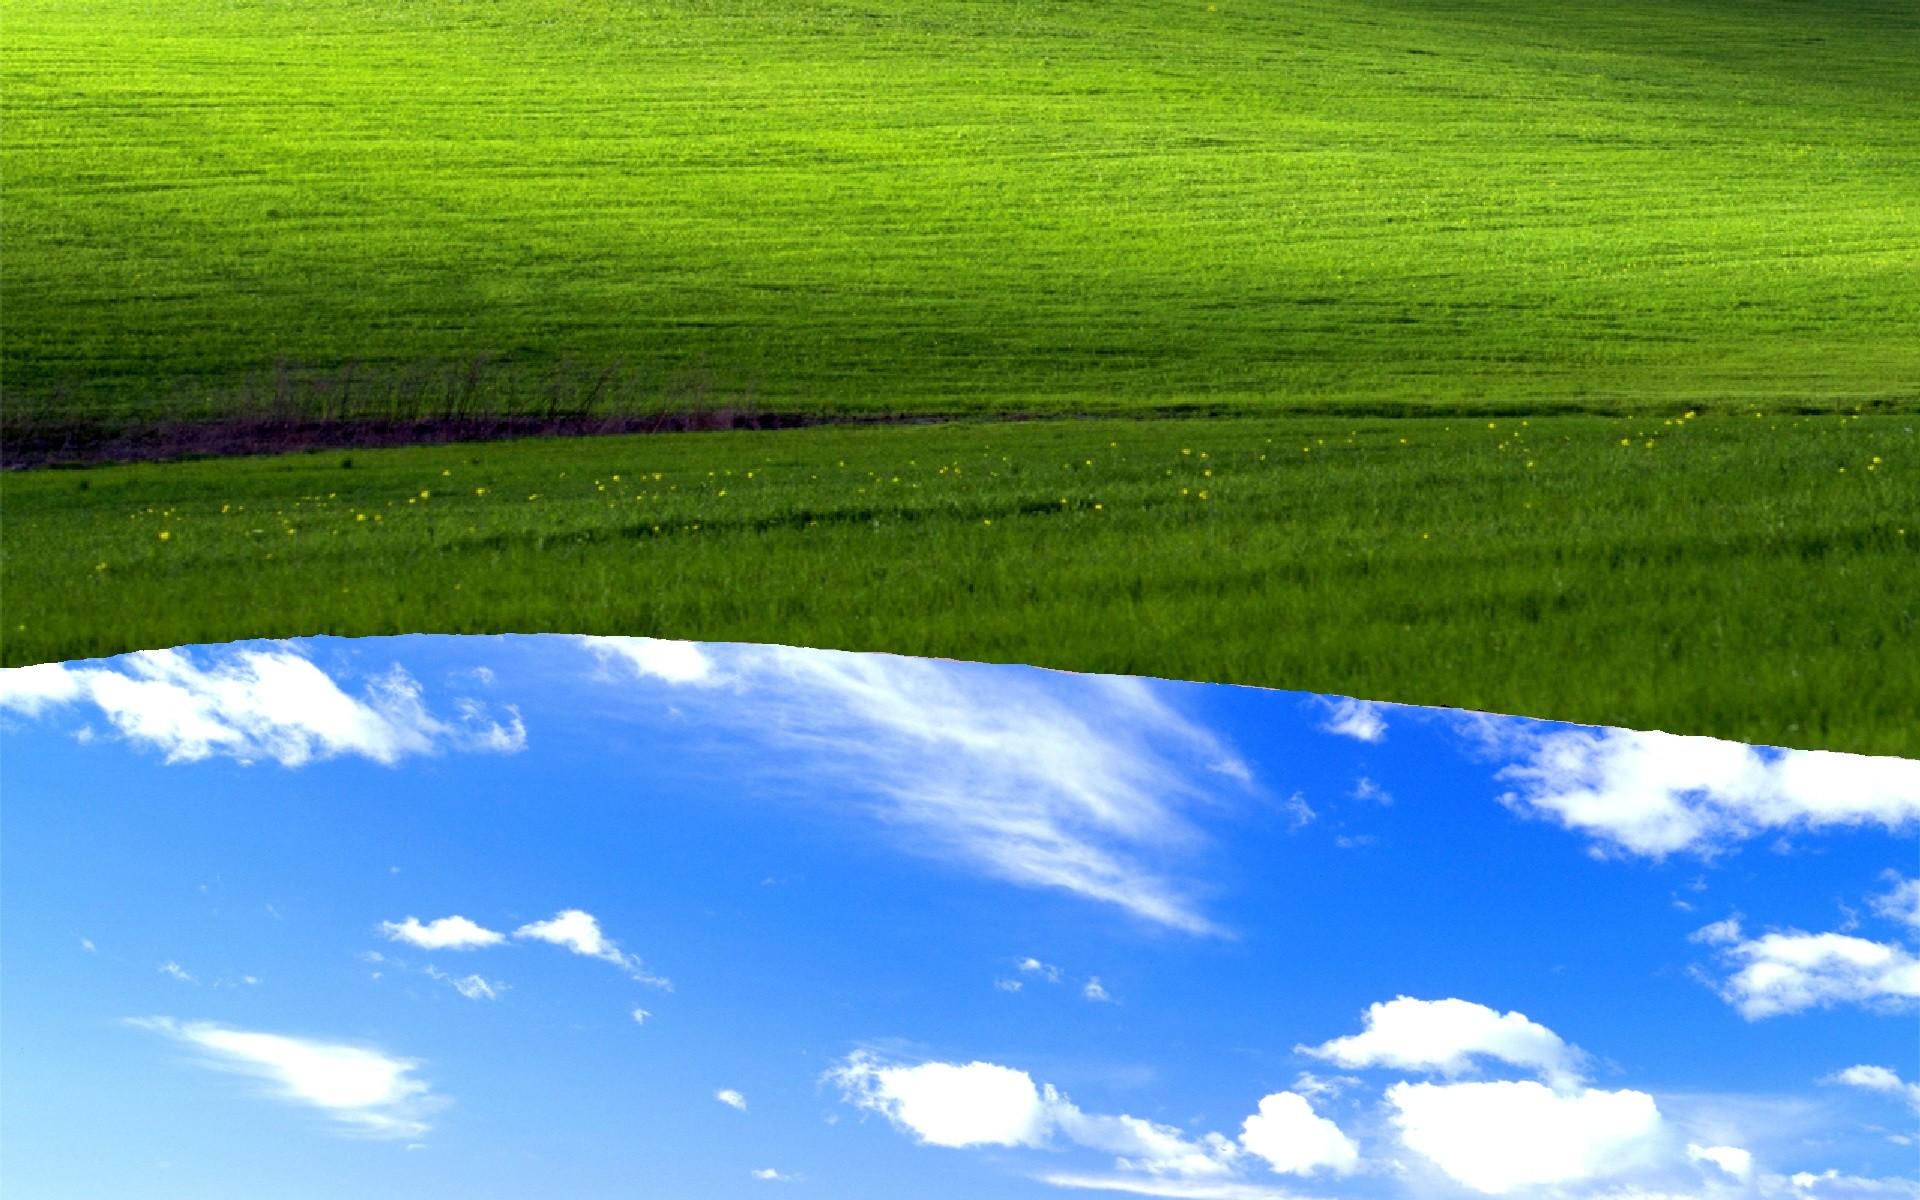 Sfondi windows xp